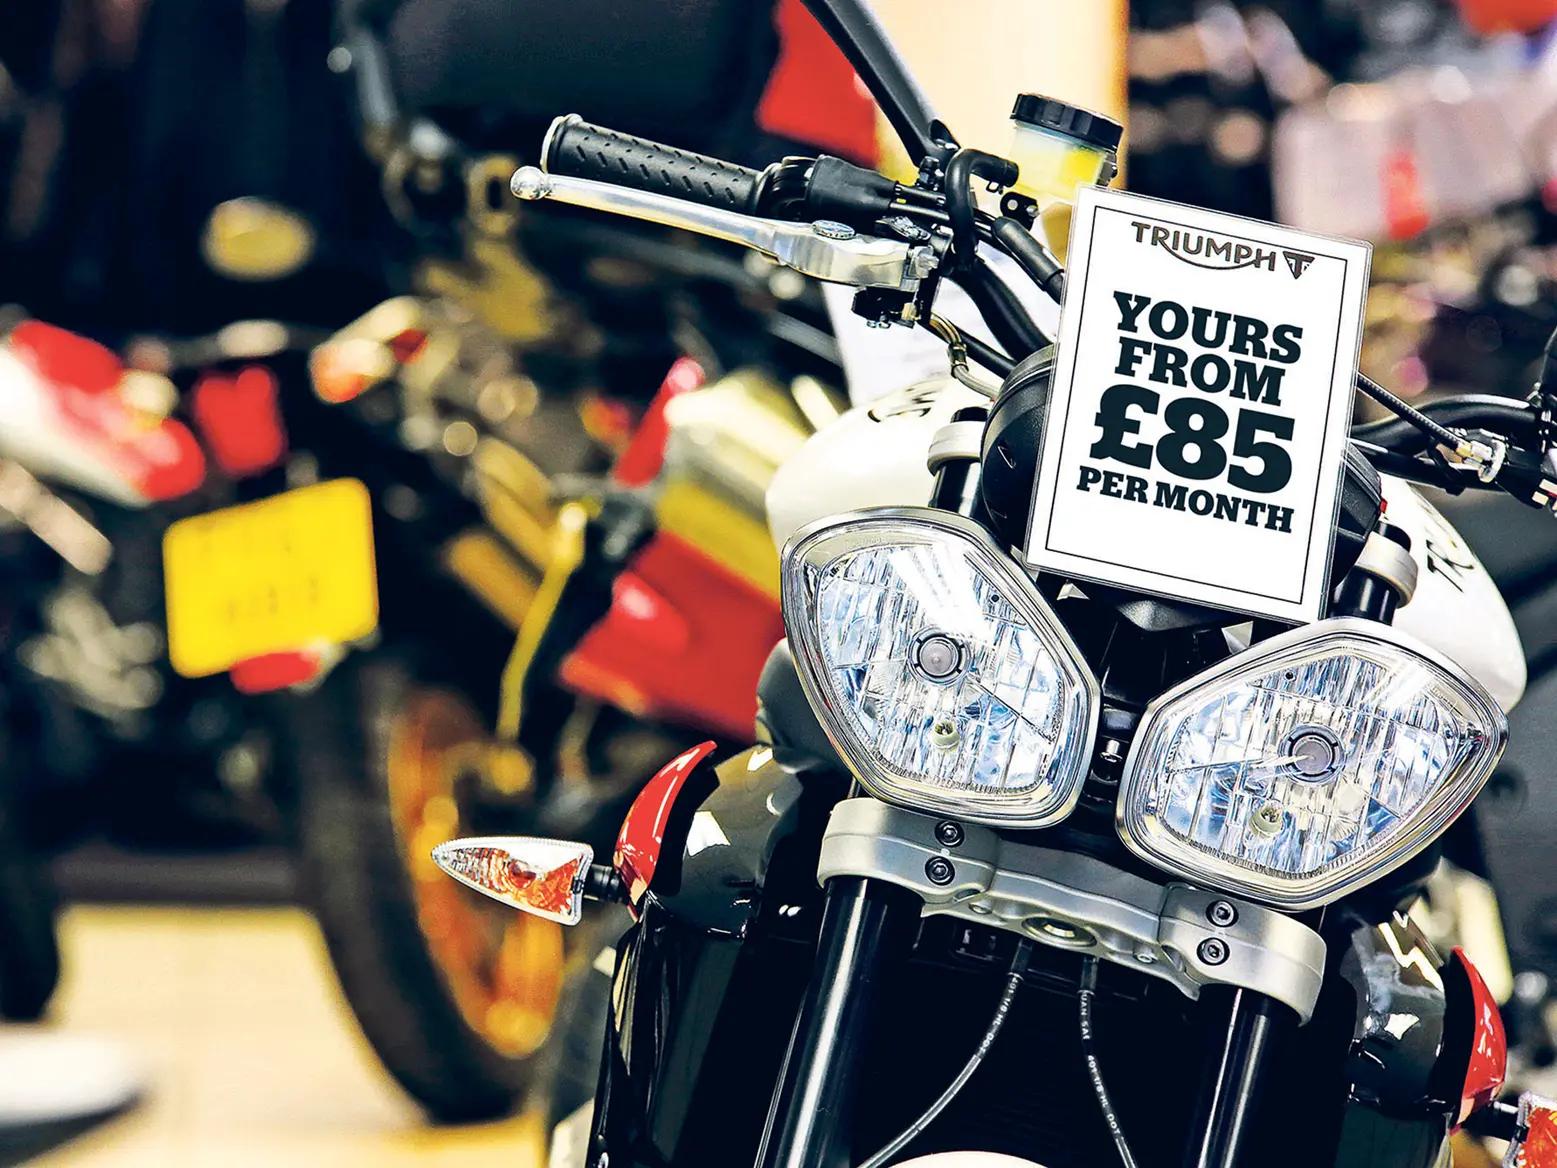 motorbike-close-up